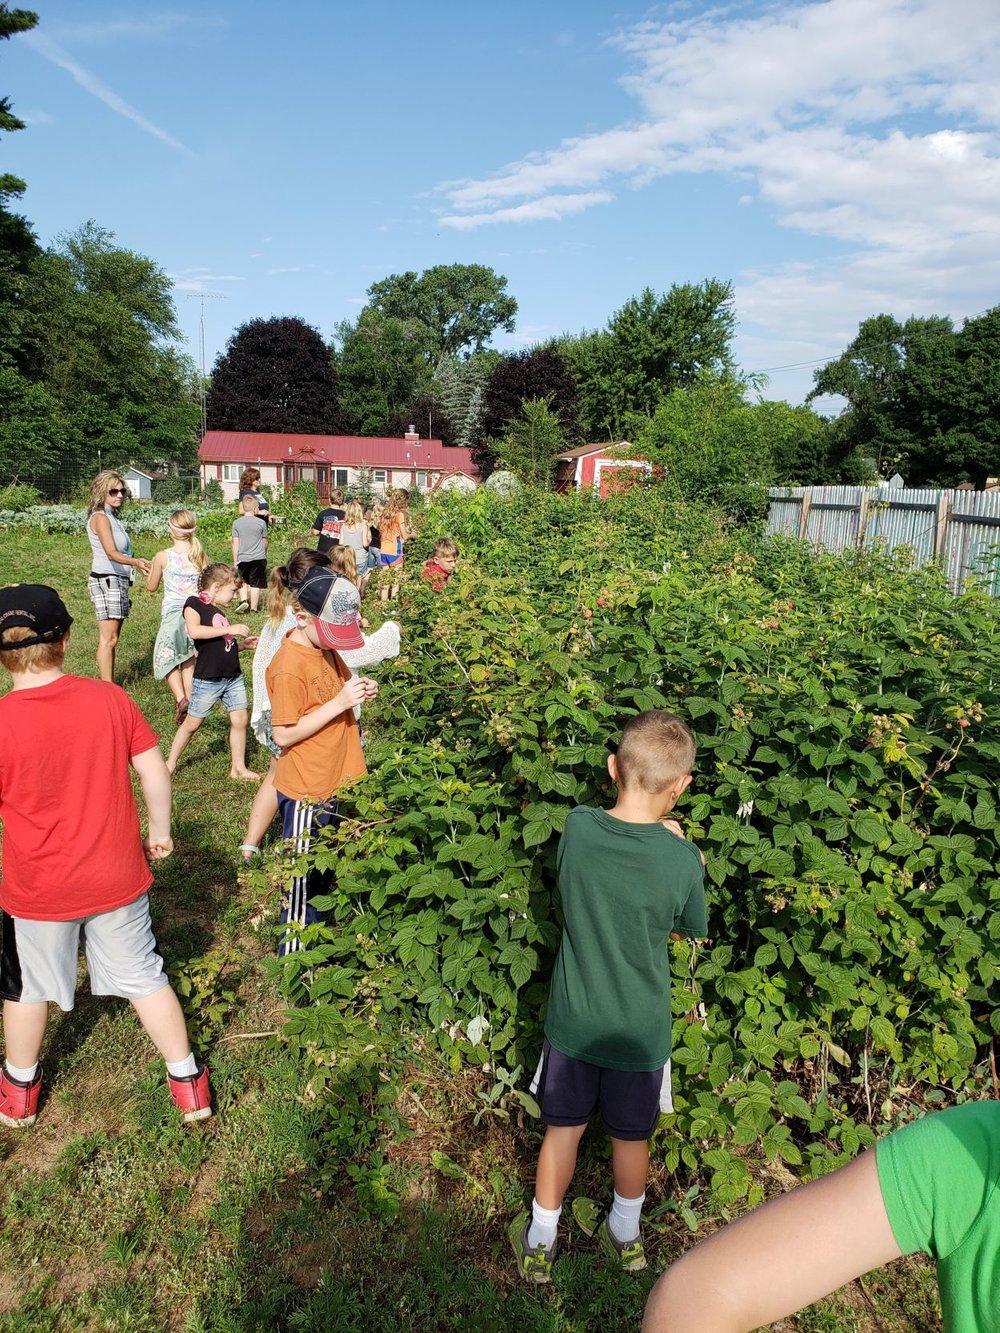 Students harvesting raspberries from their school garden.